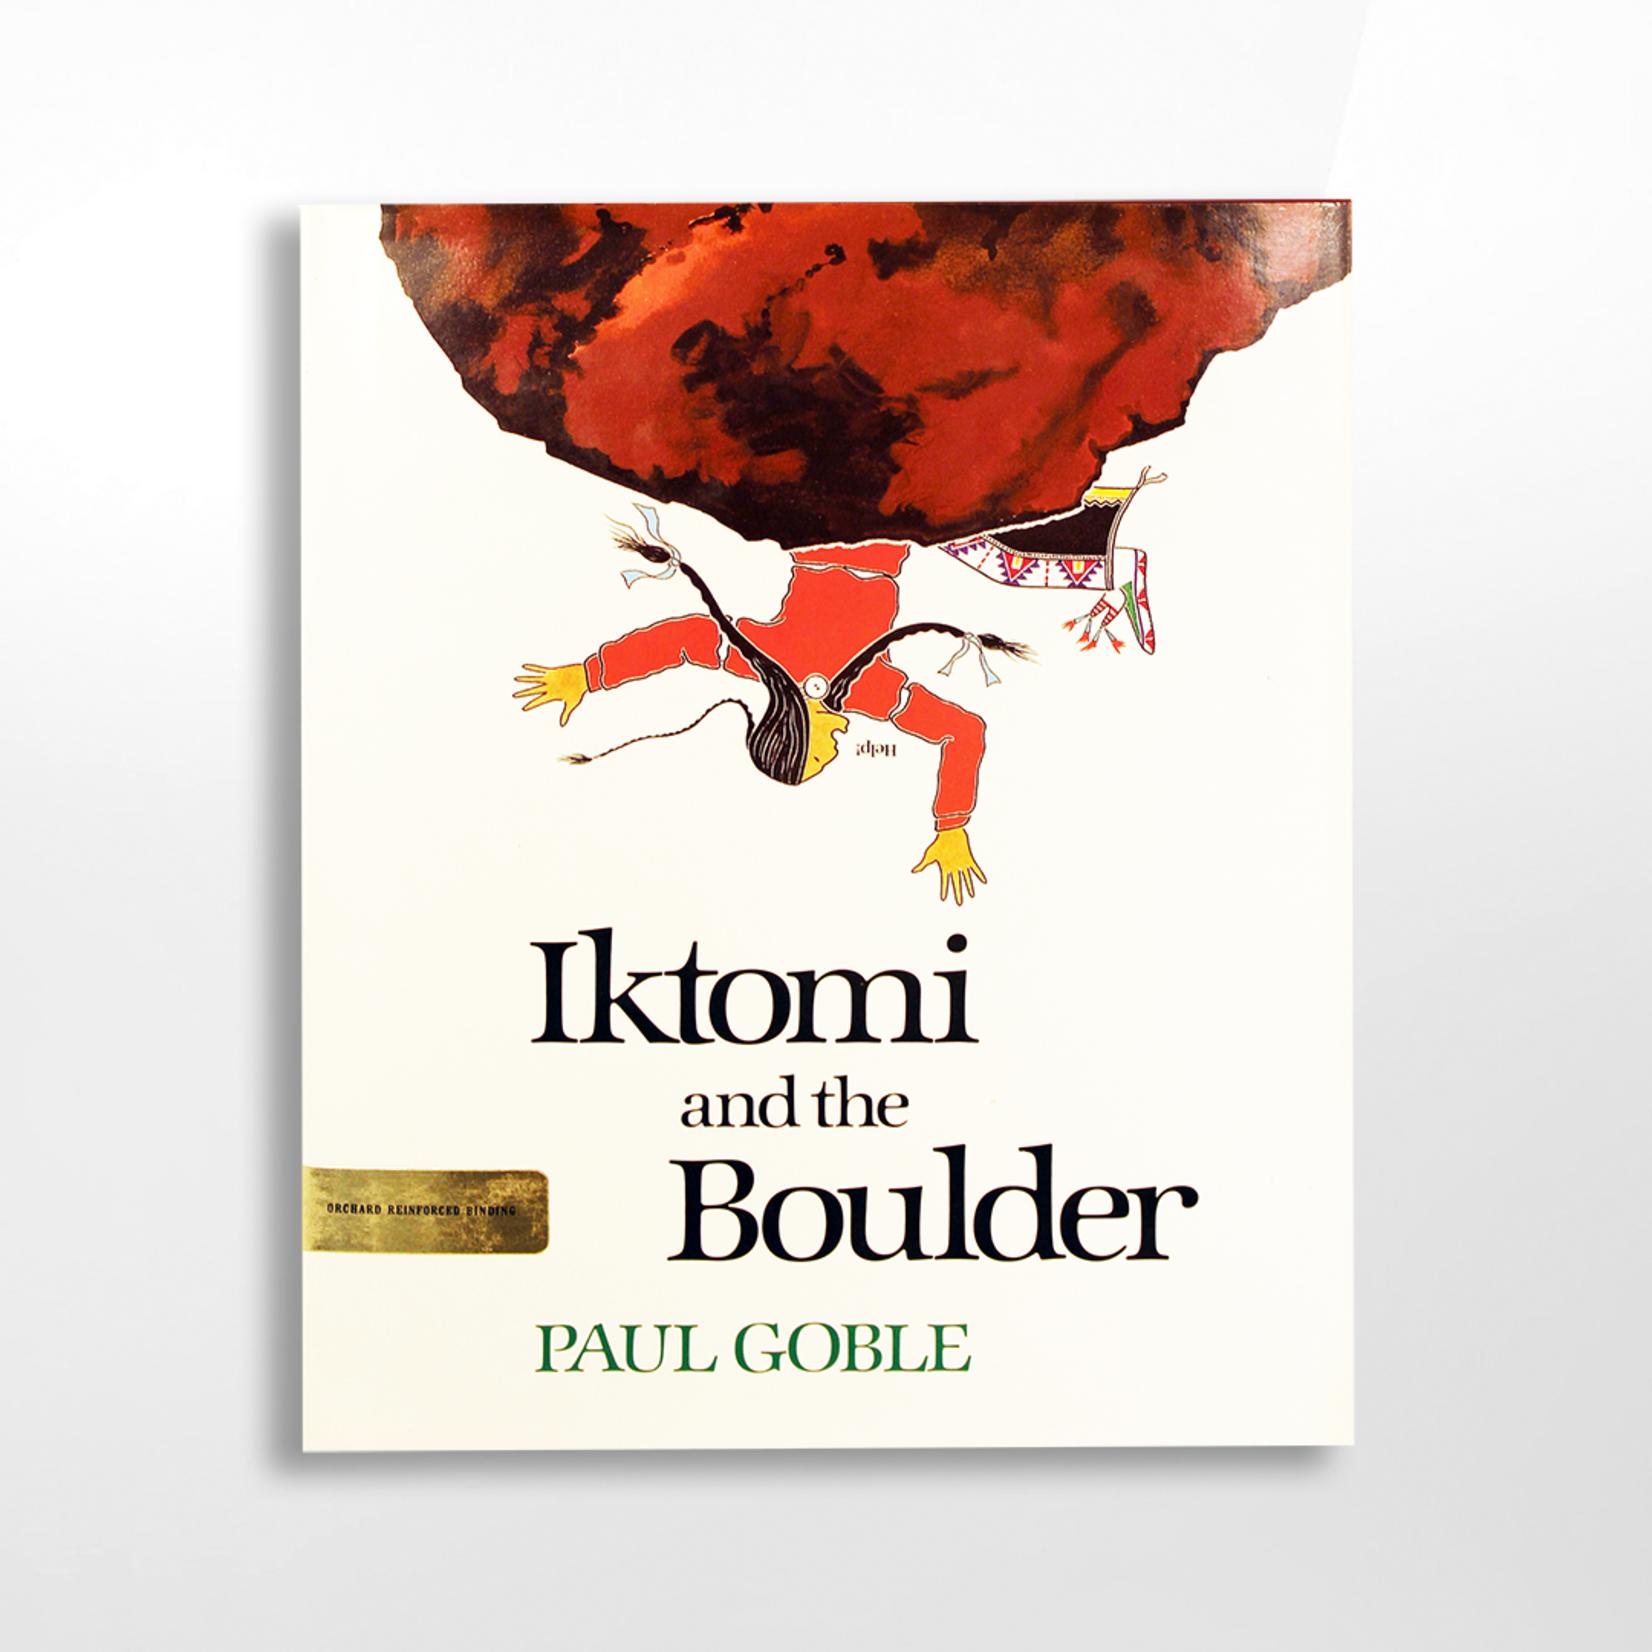 Dakota West Books Books, DWB357, Iktomi & the Boulder - cloth, Goble